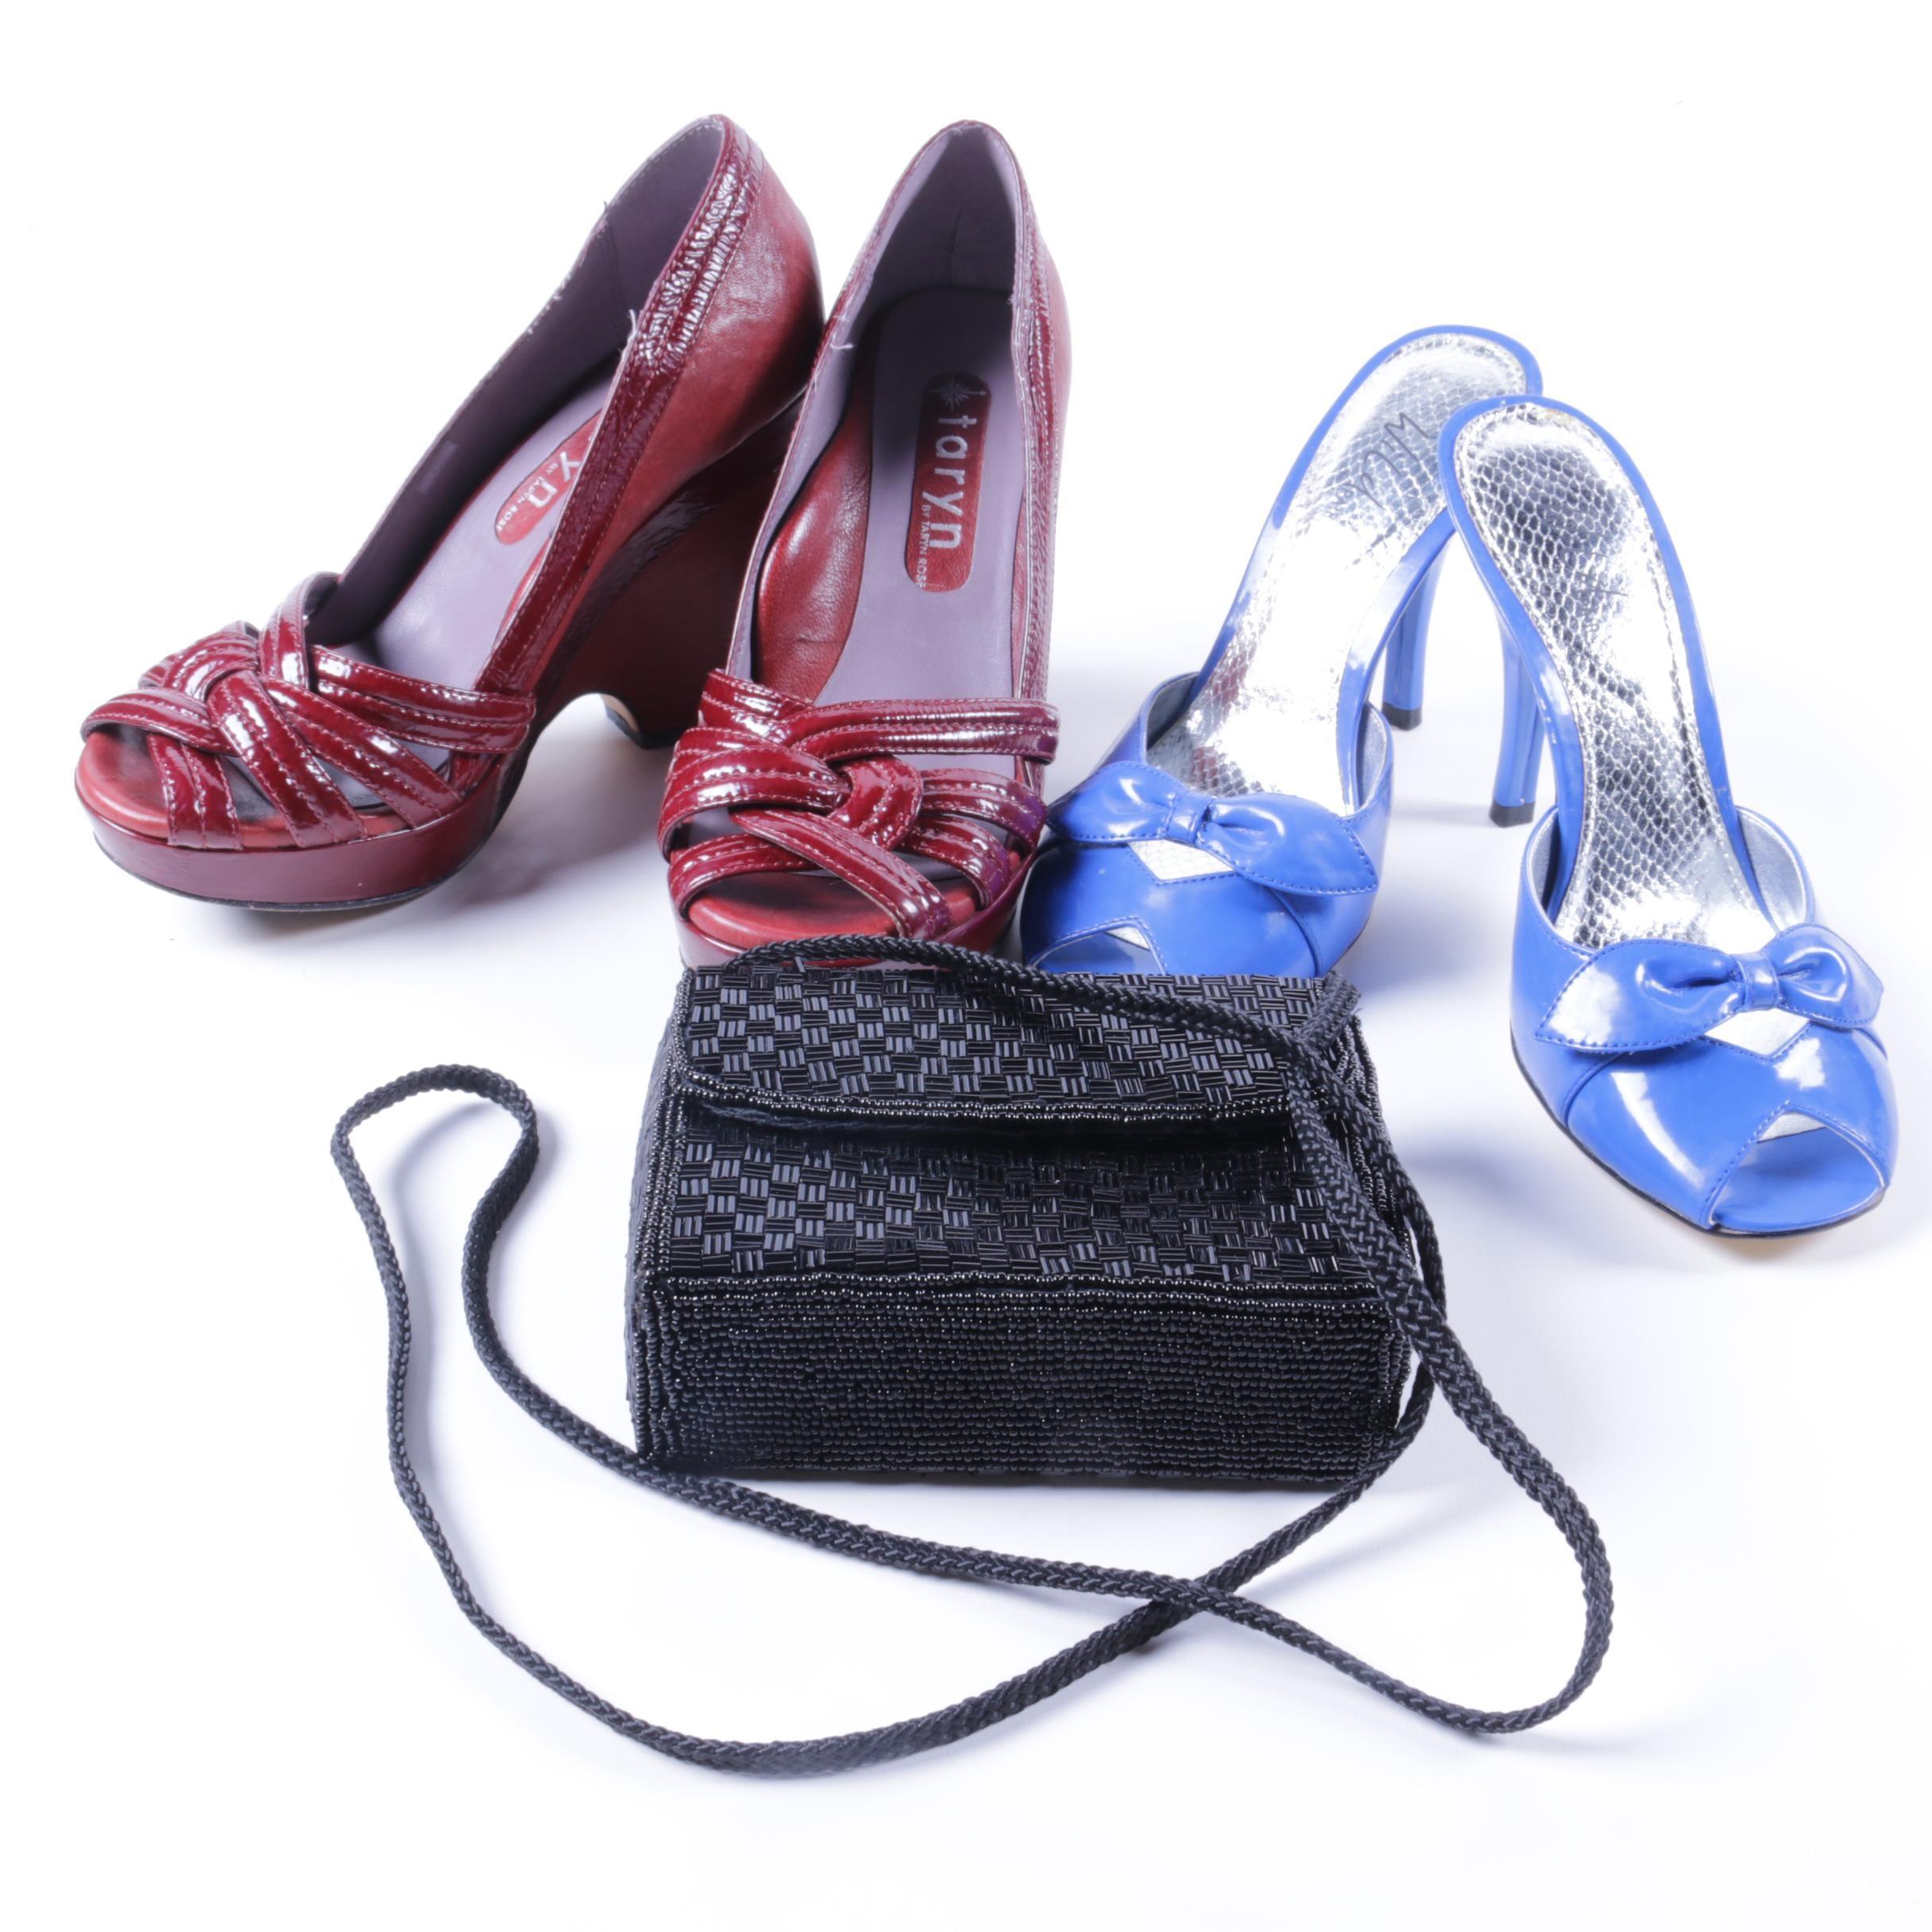 Women's Heels and Magid Beaded Handbag